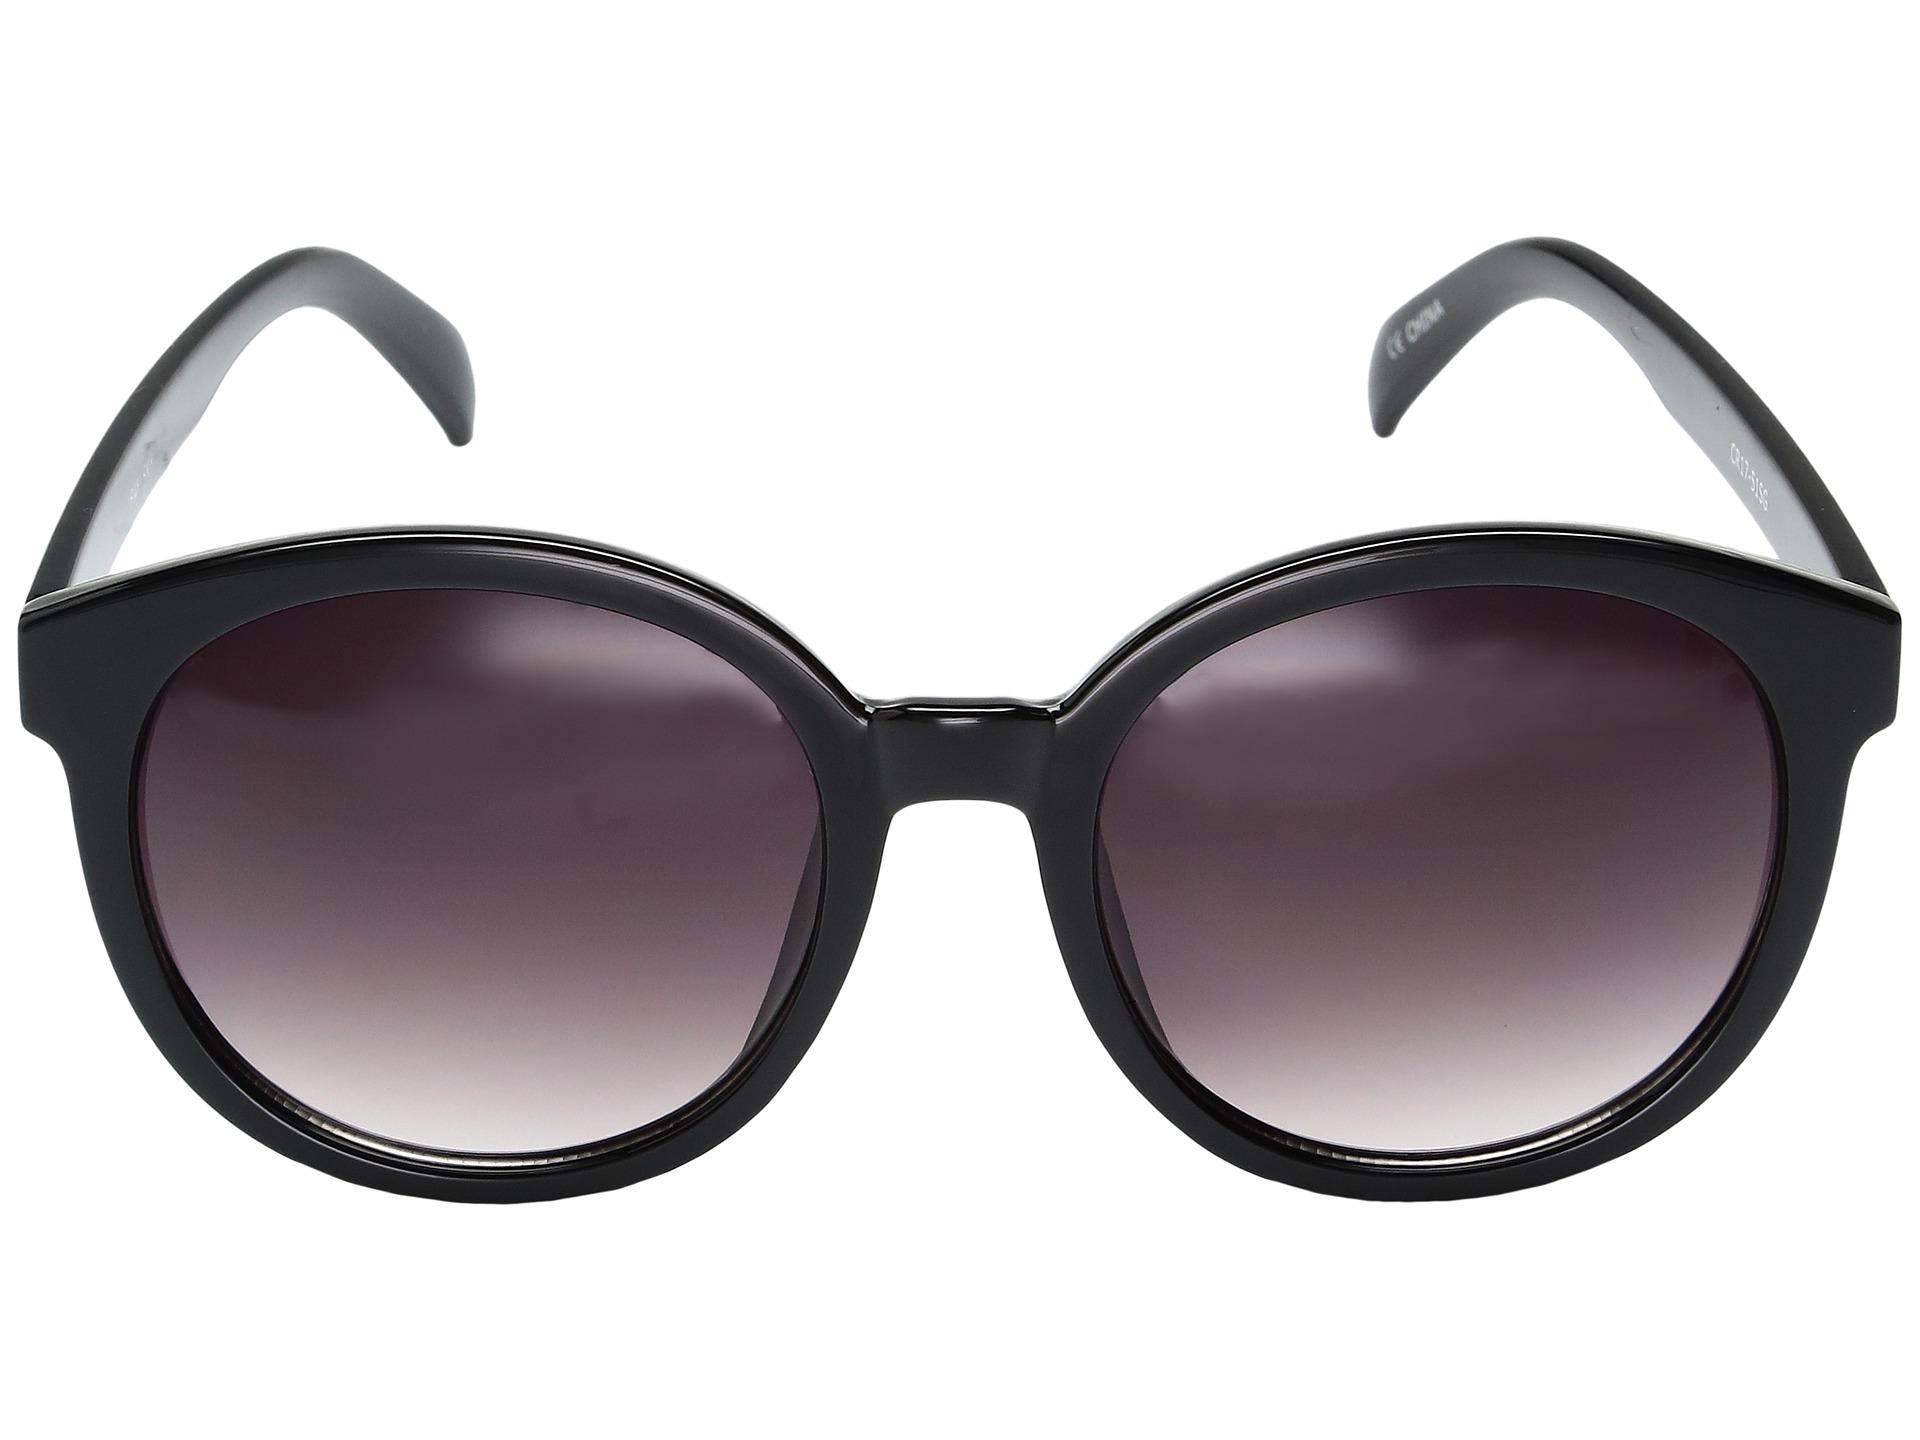 san diego hat company bsg1004 frame sunglasses with